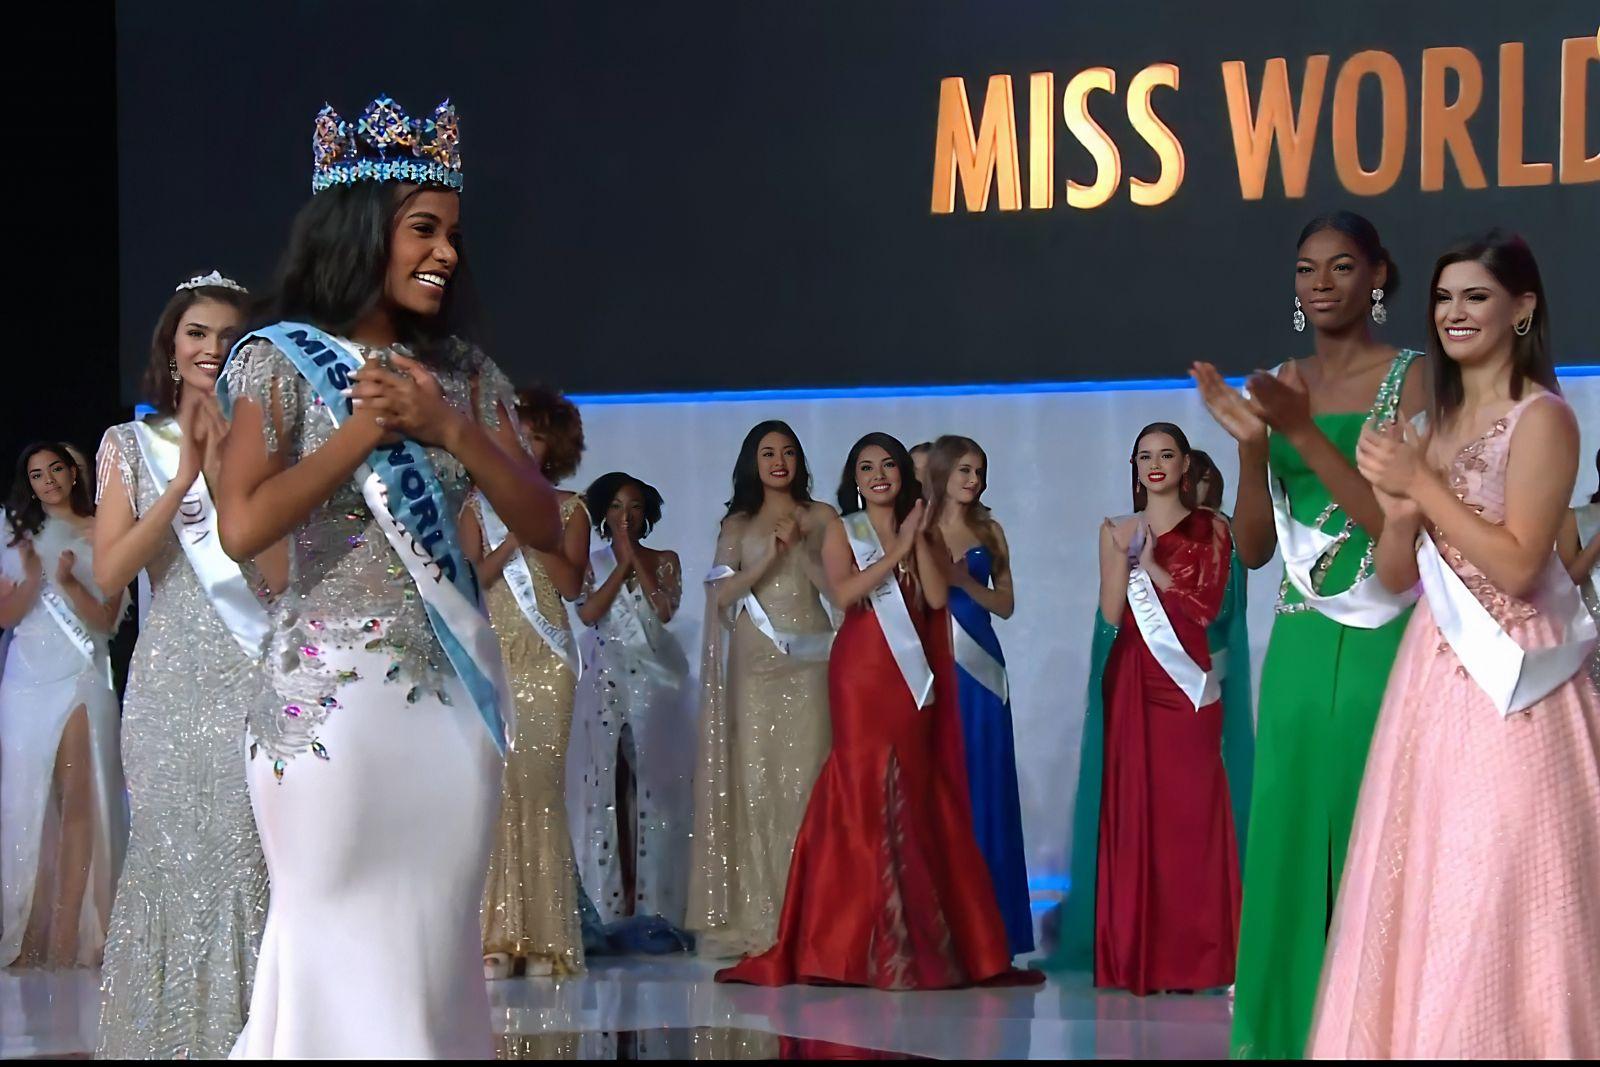 toni-ann singh, miss world 2019. - Página 2 Img_6110